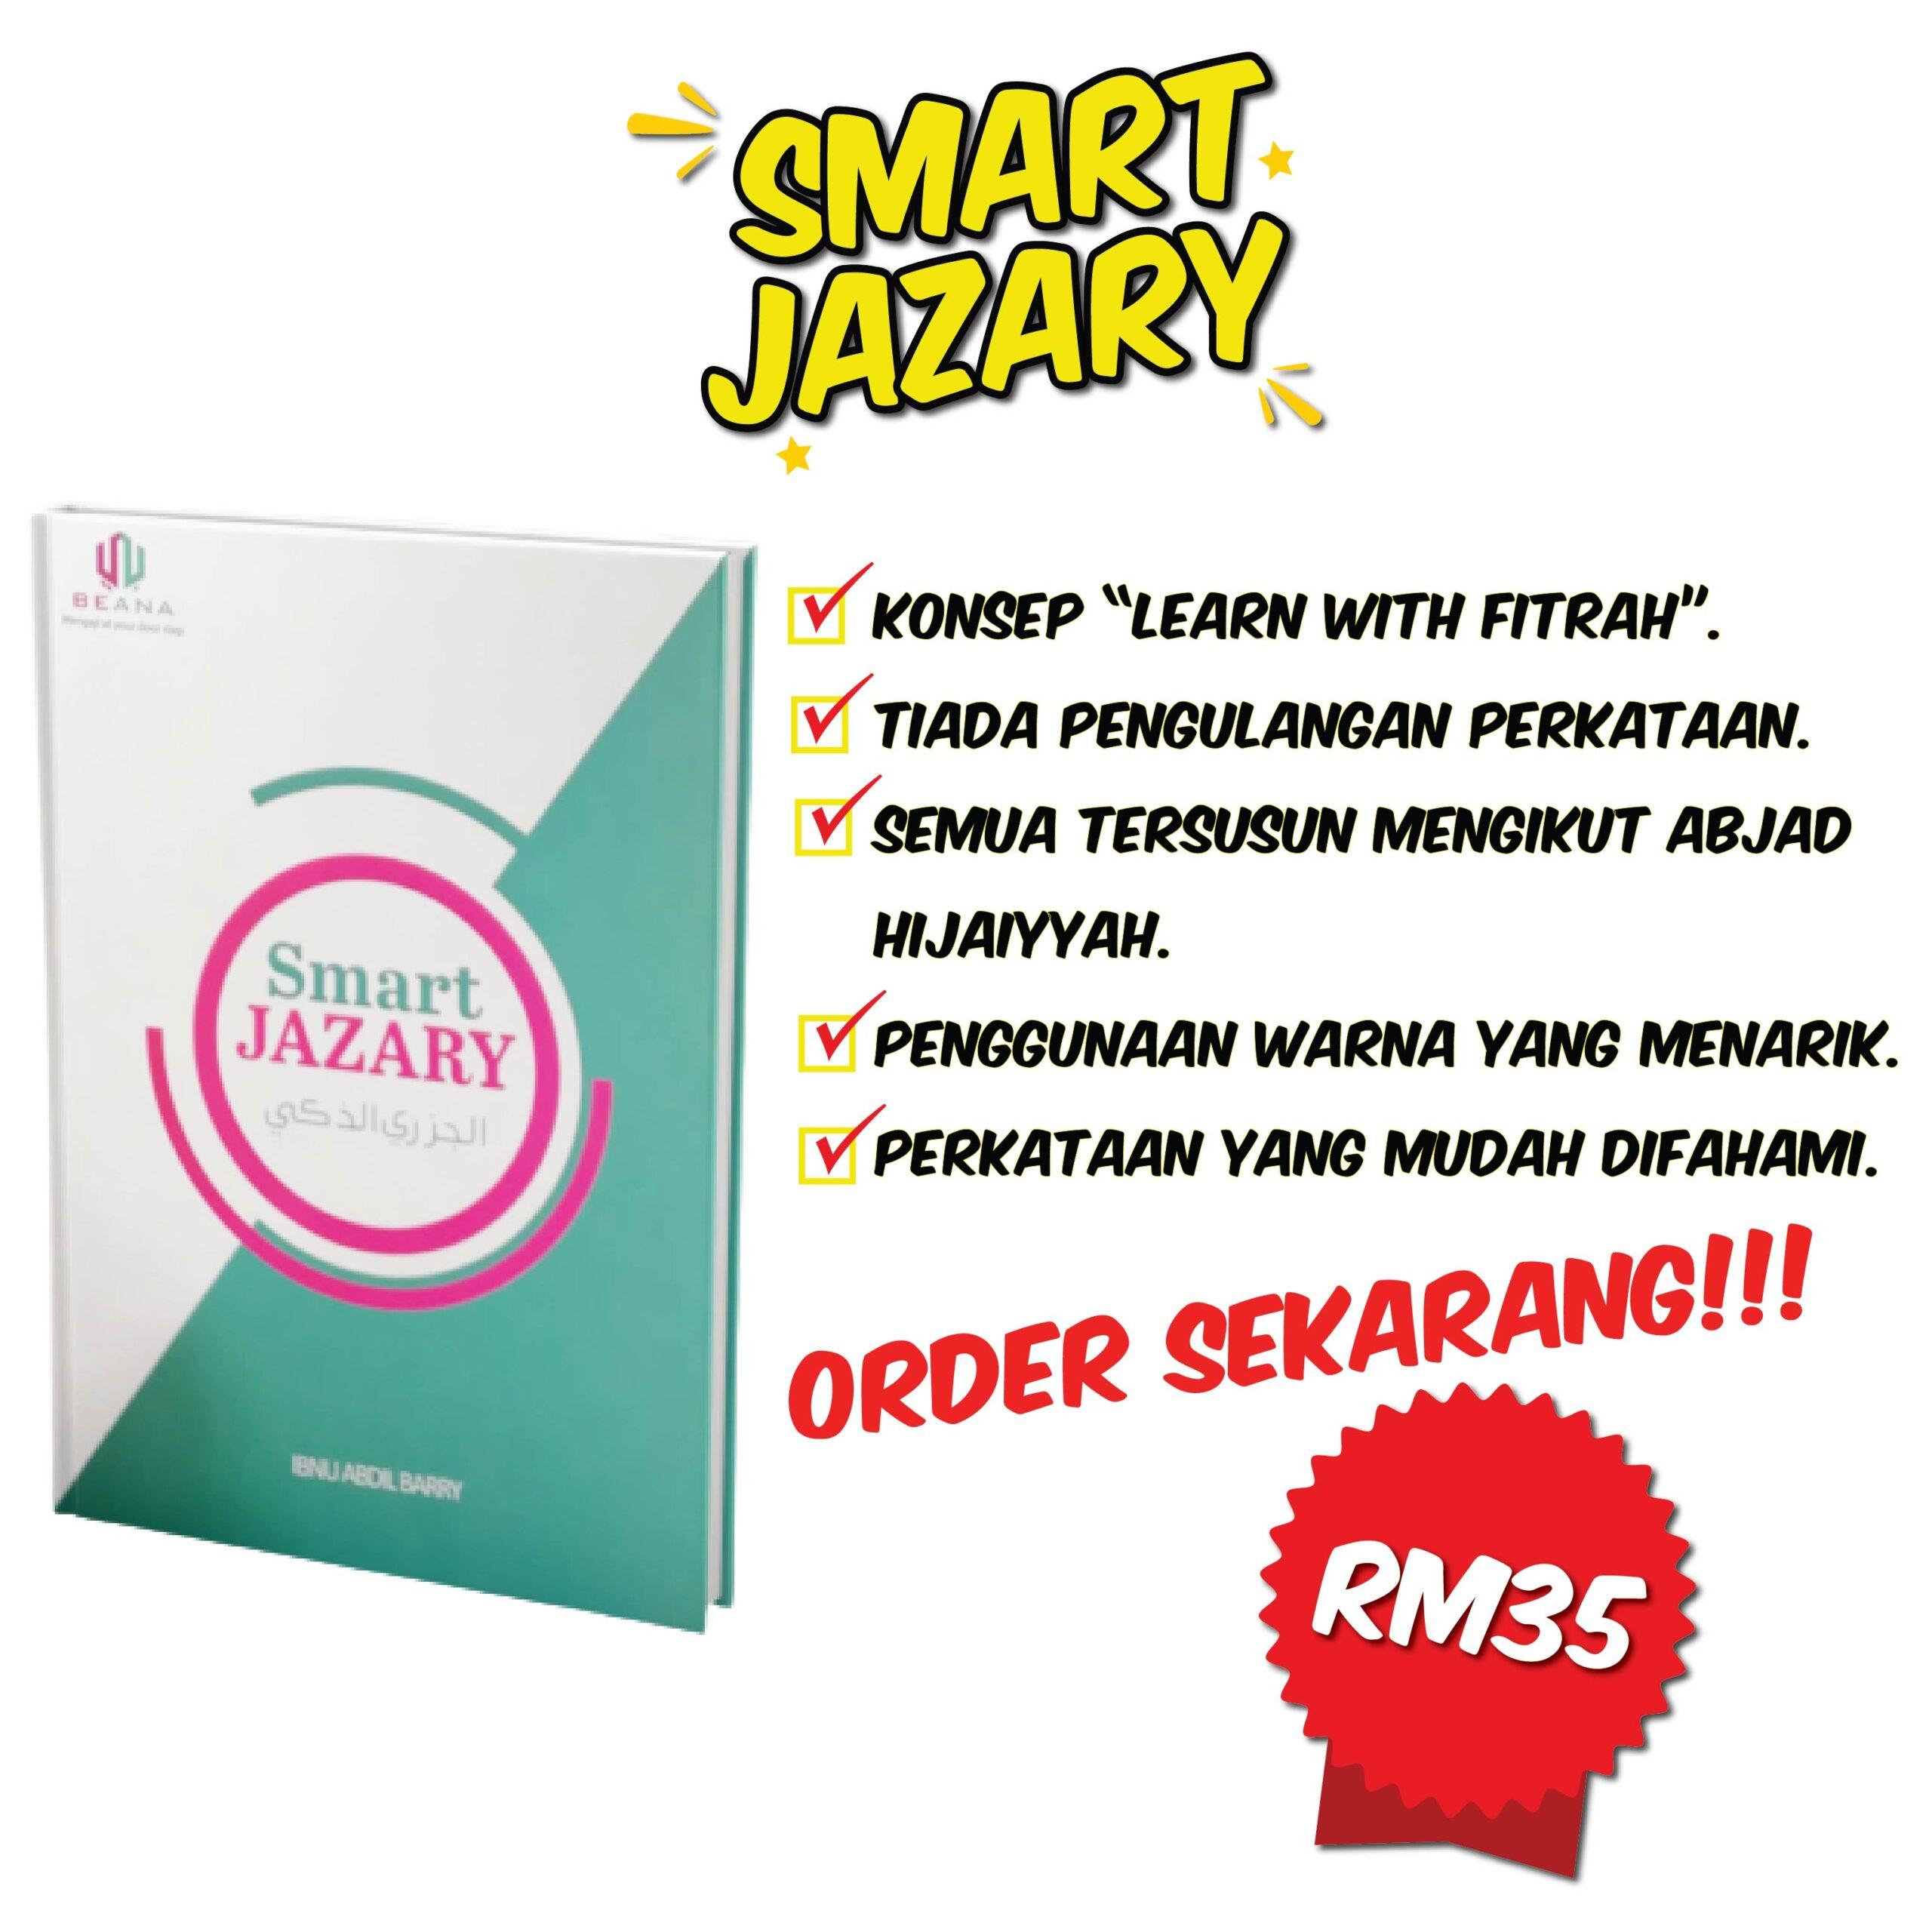 POSTER SMART JAZARY UNTUK AGENT FB ADS-02